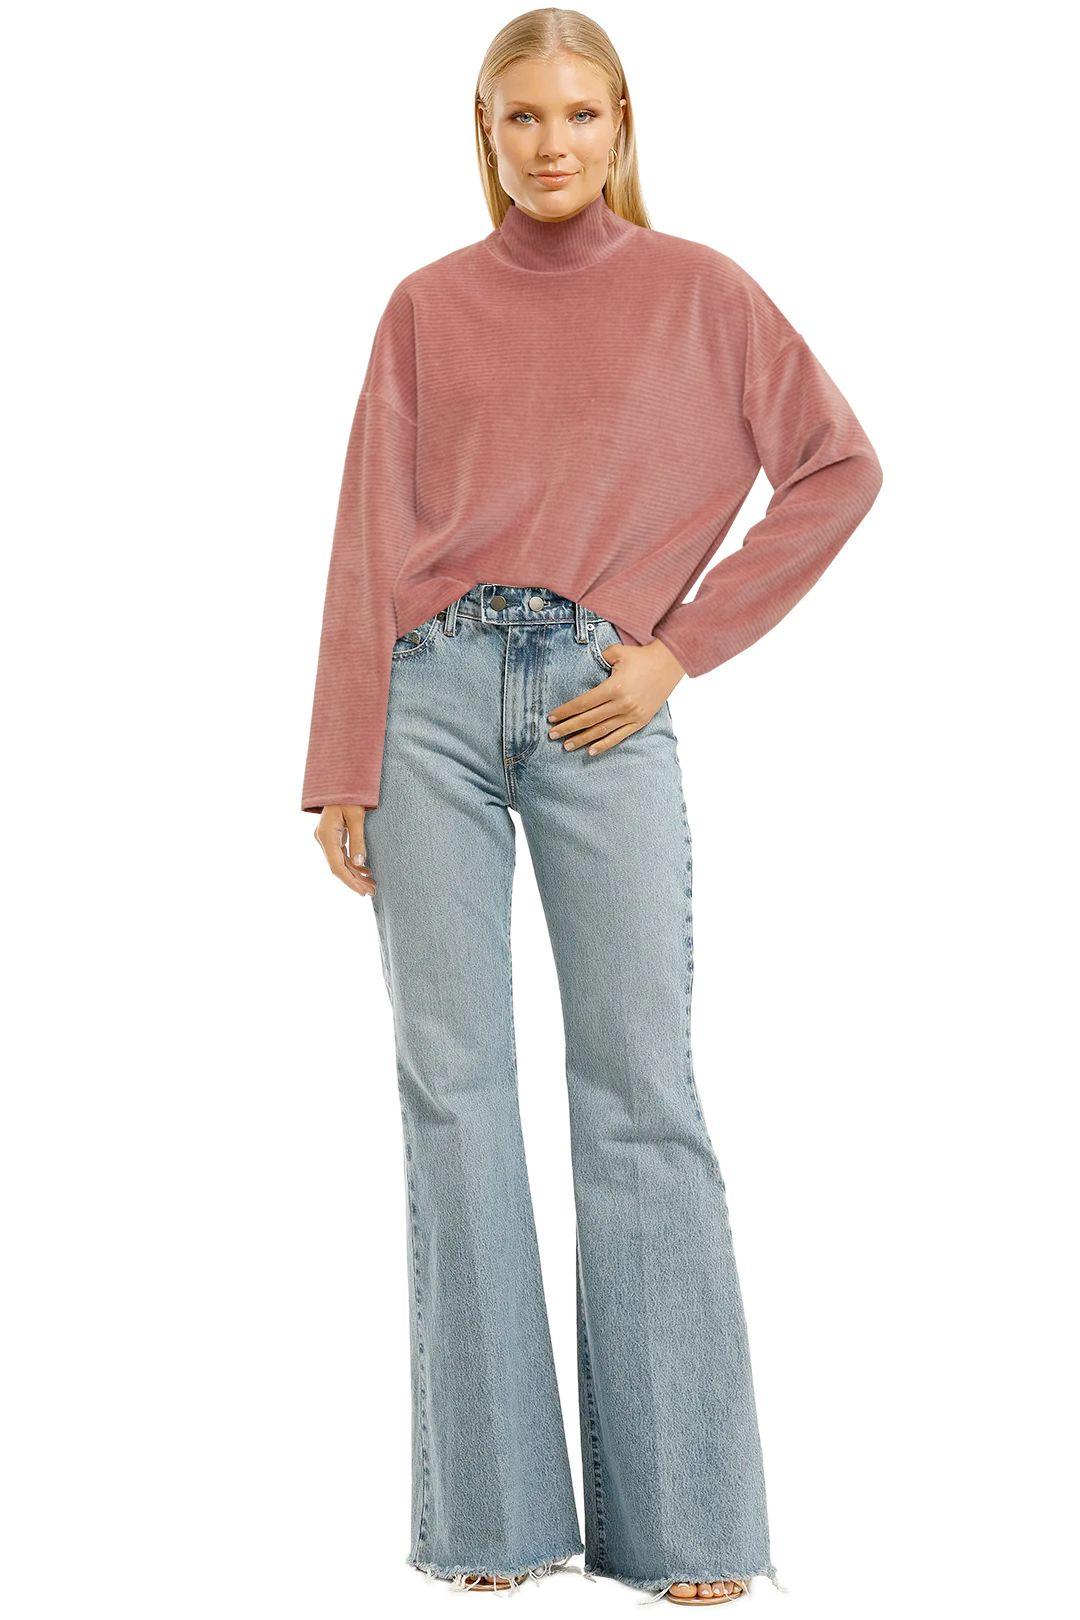 MNG-Ribbed-Velvet-Sweatshirt-Pink-Front